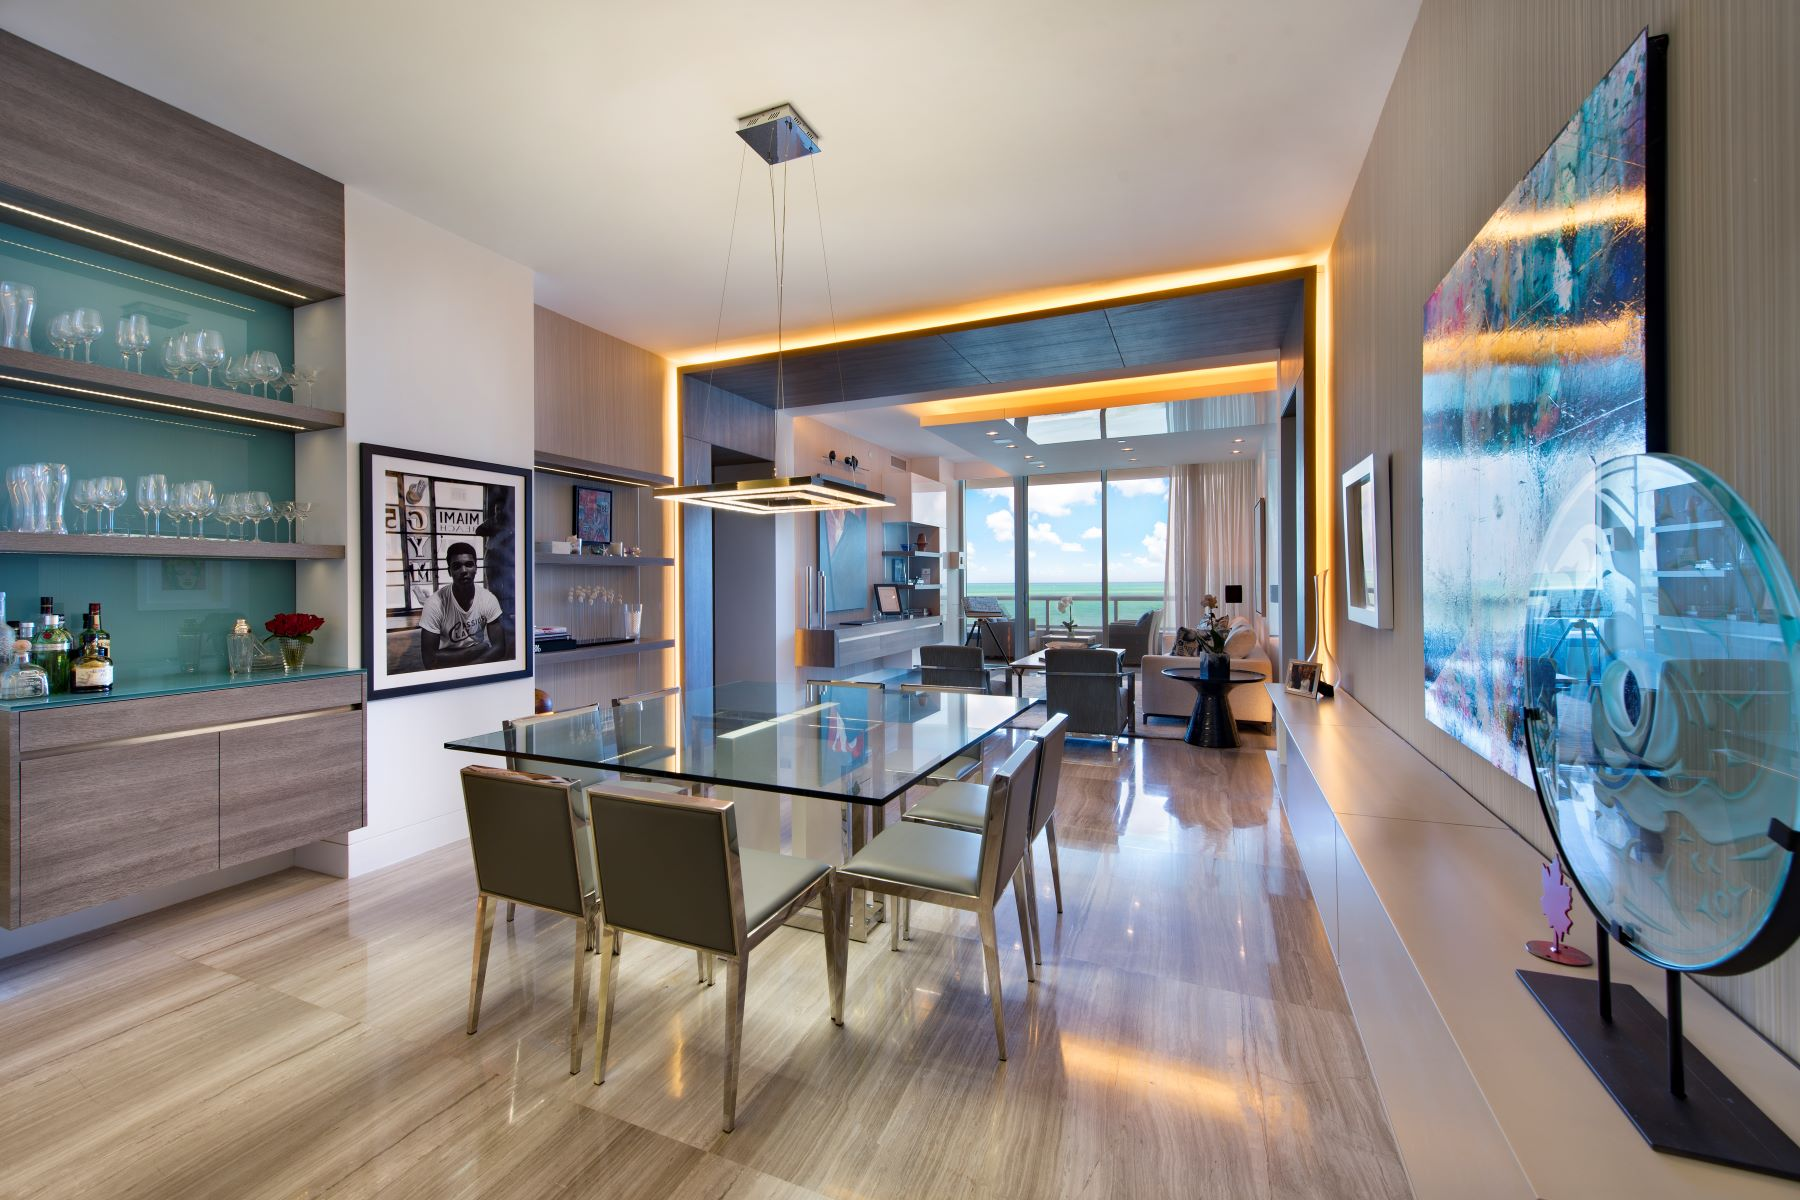 Condominium for Sale at 6799 Collins Ave BH405 6799 Collins Ave 405, Miami Beach, Florida, 33141 United States